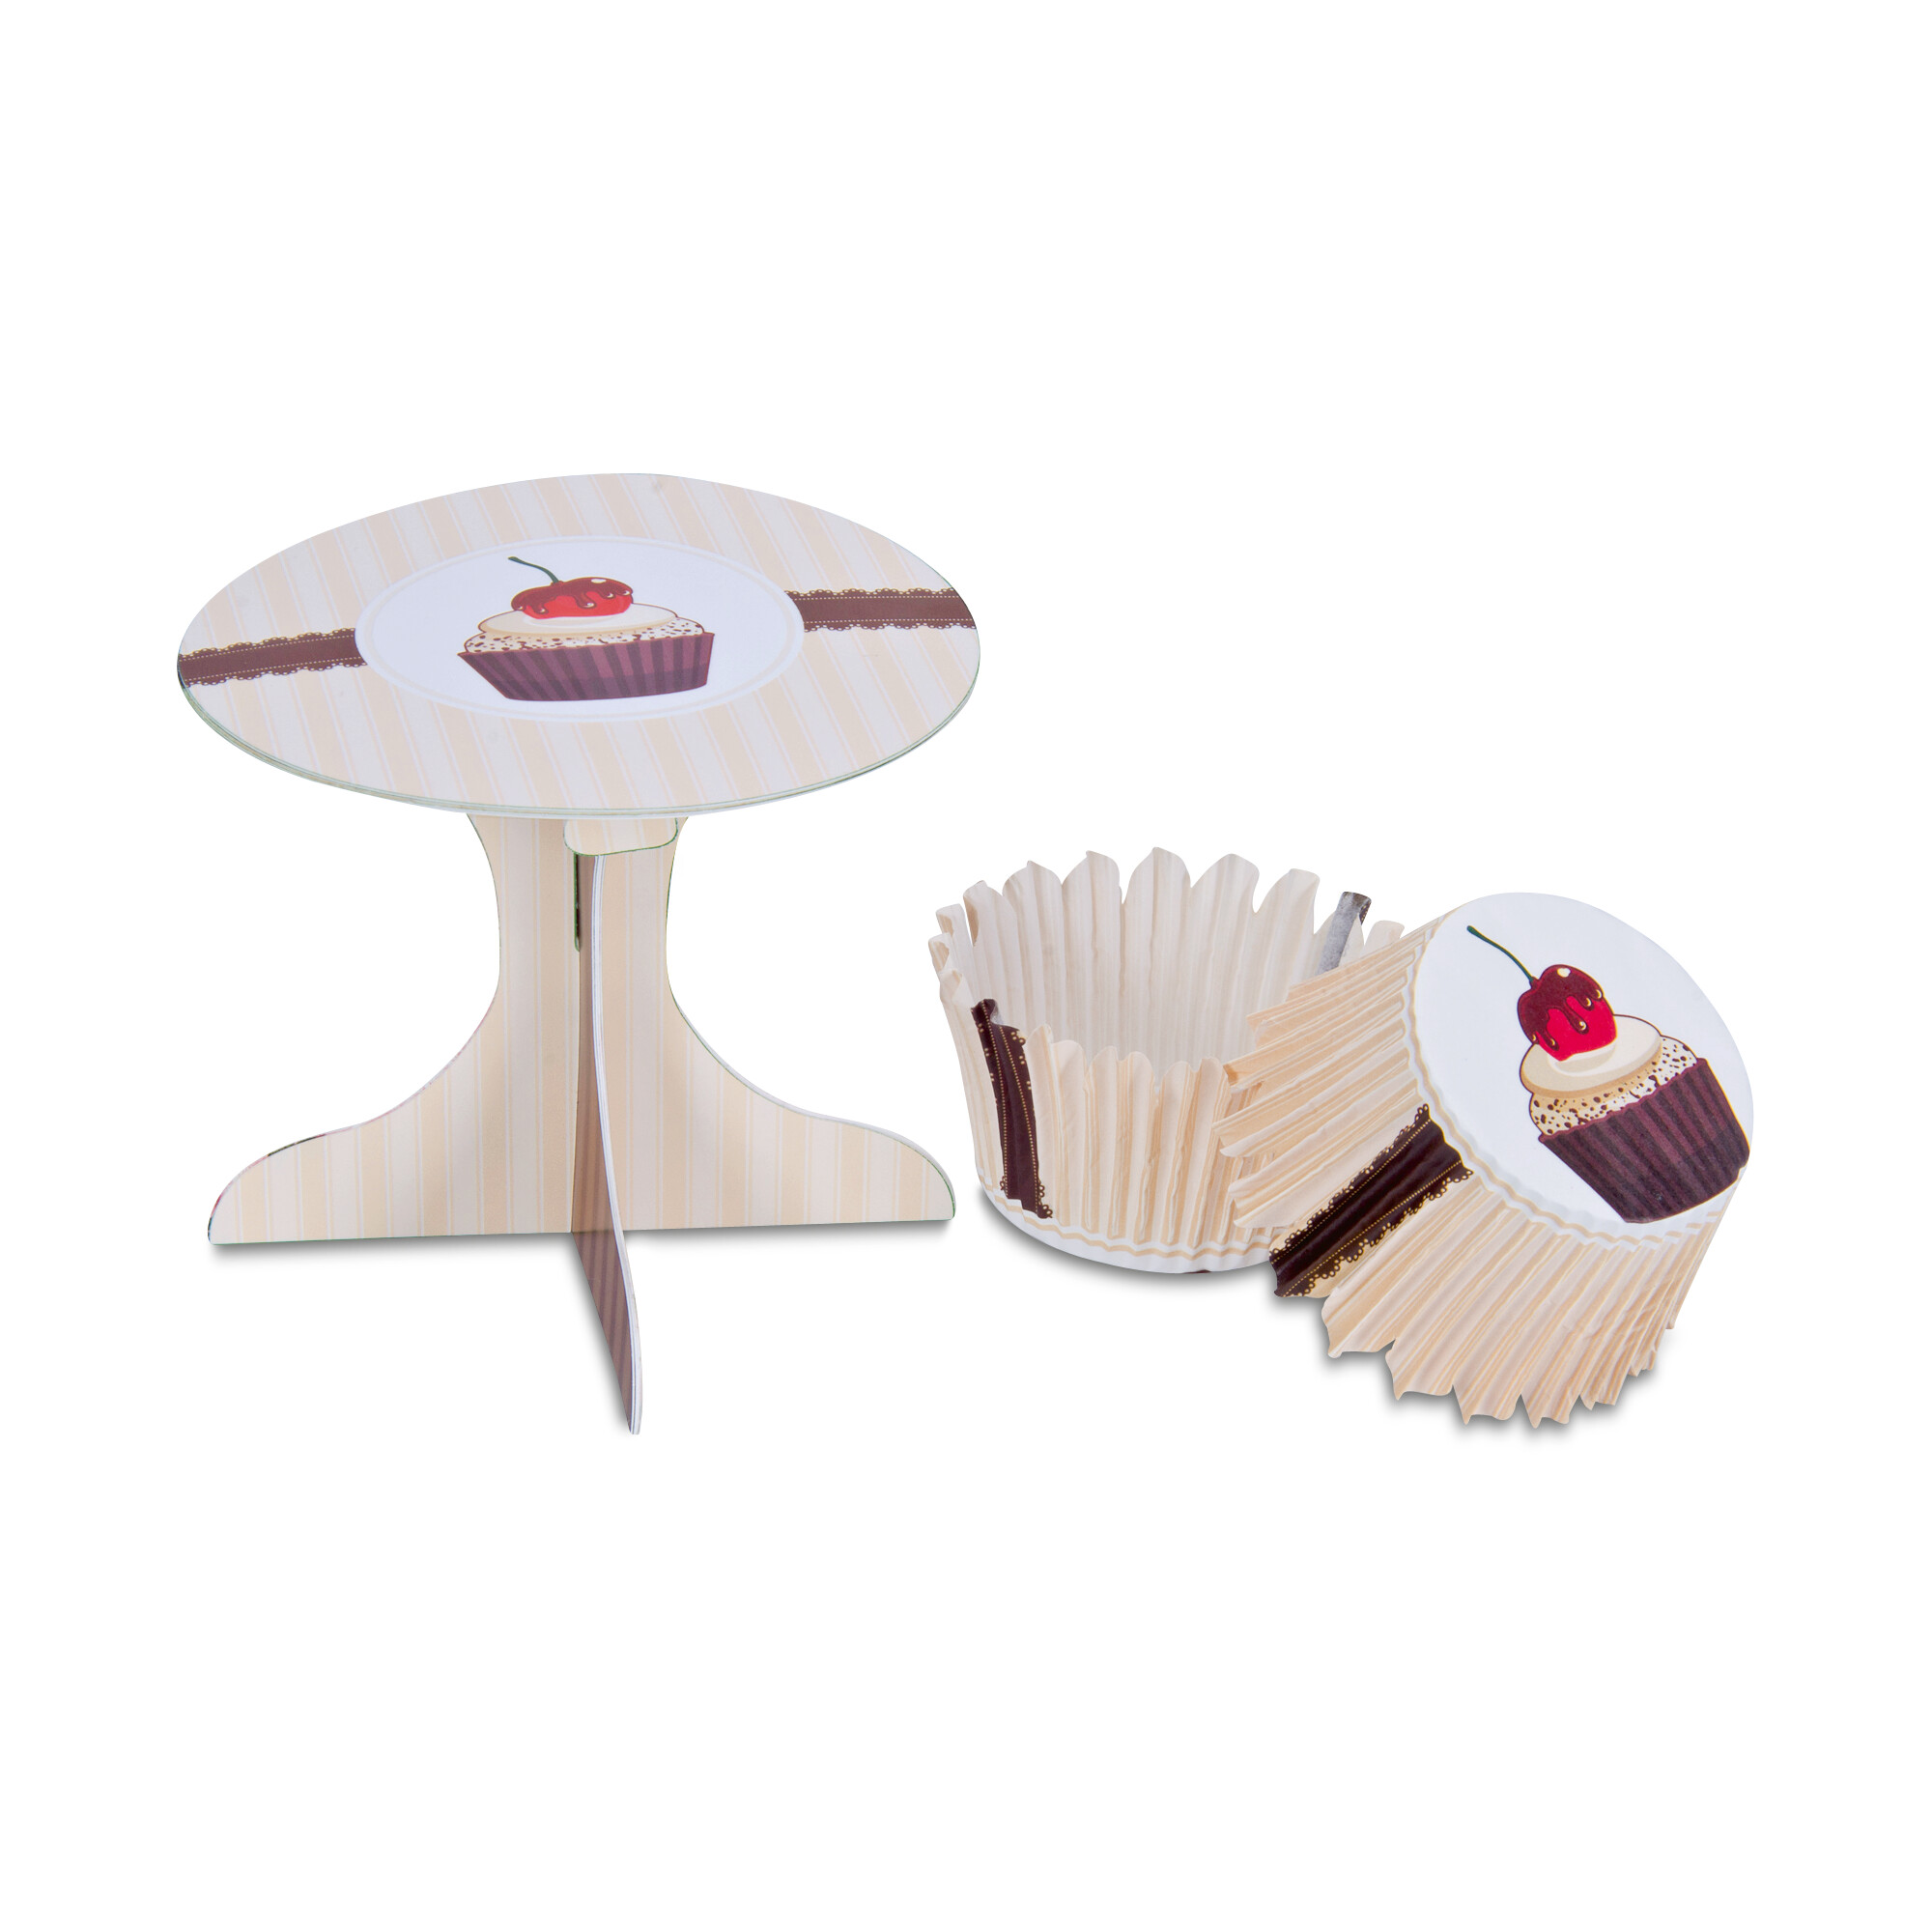 Cupcake deko - Café - Set, 36 parts